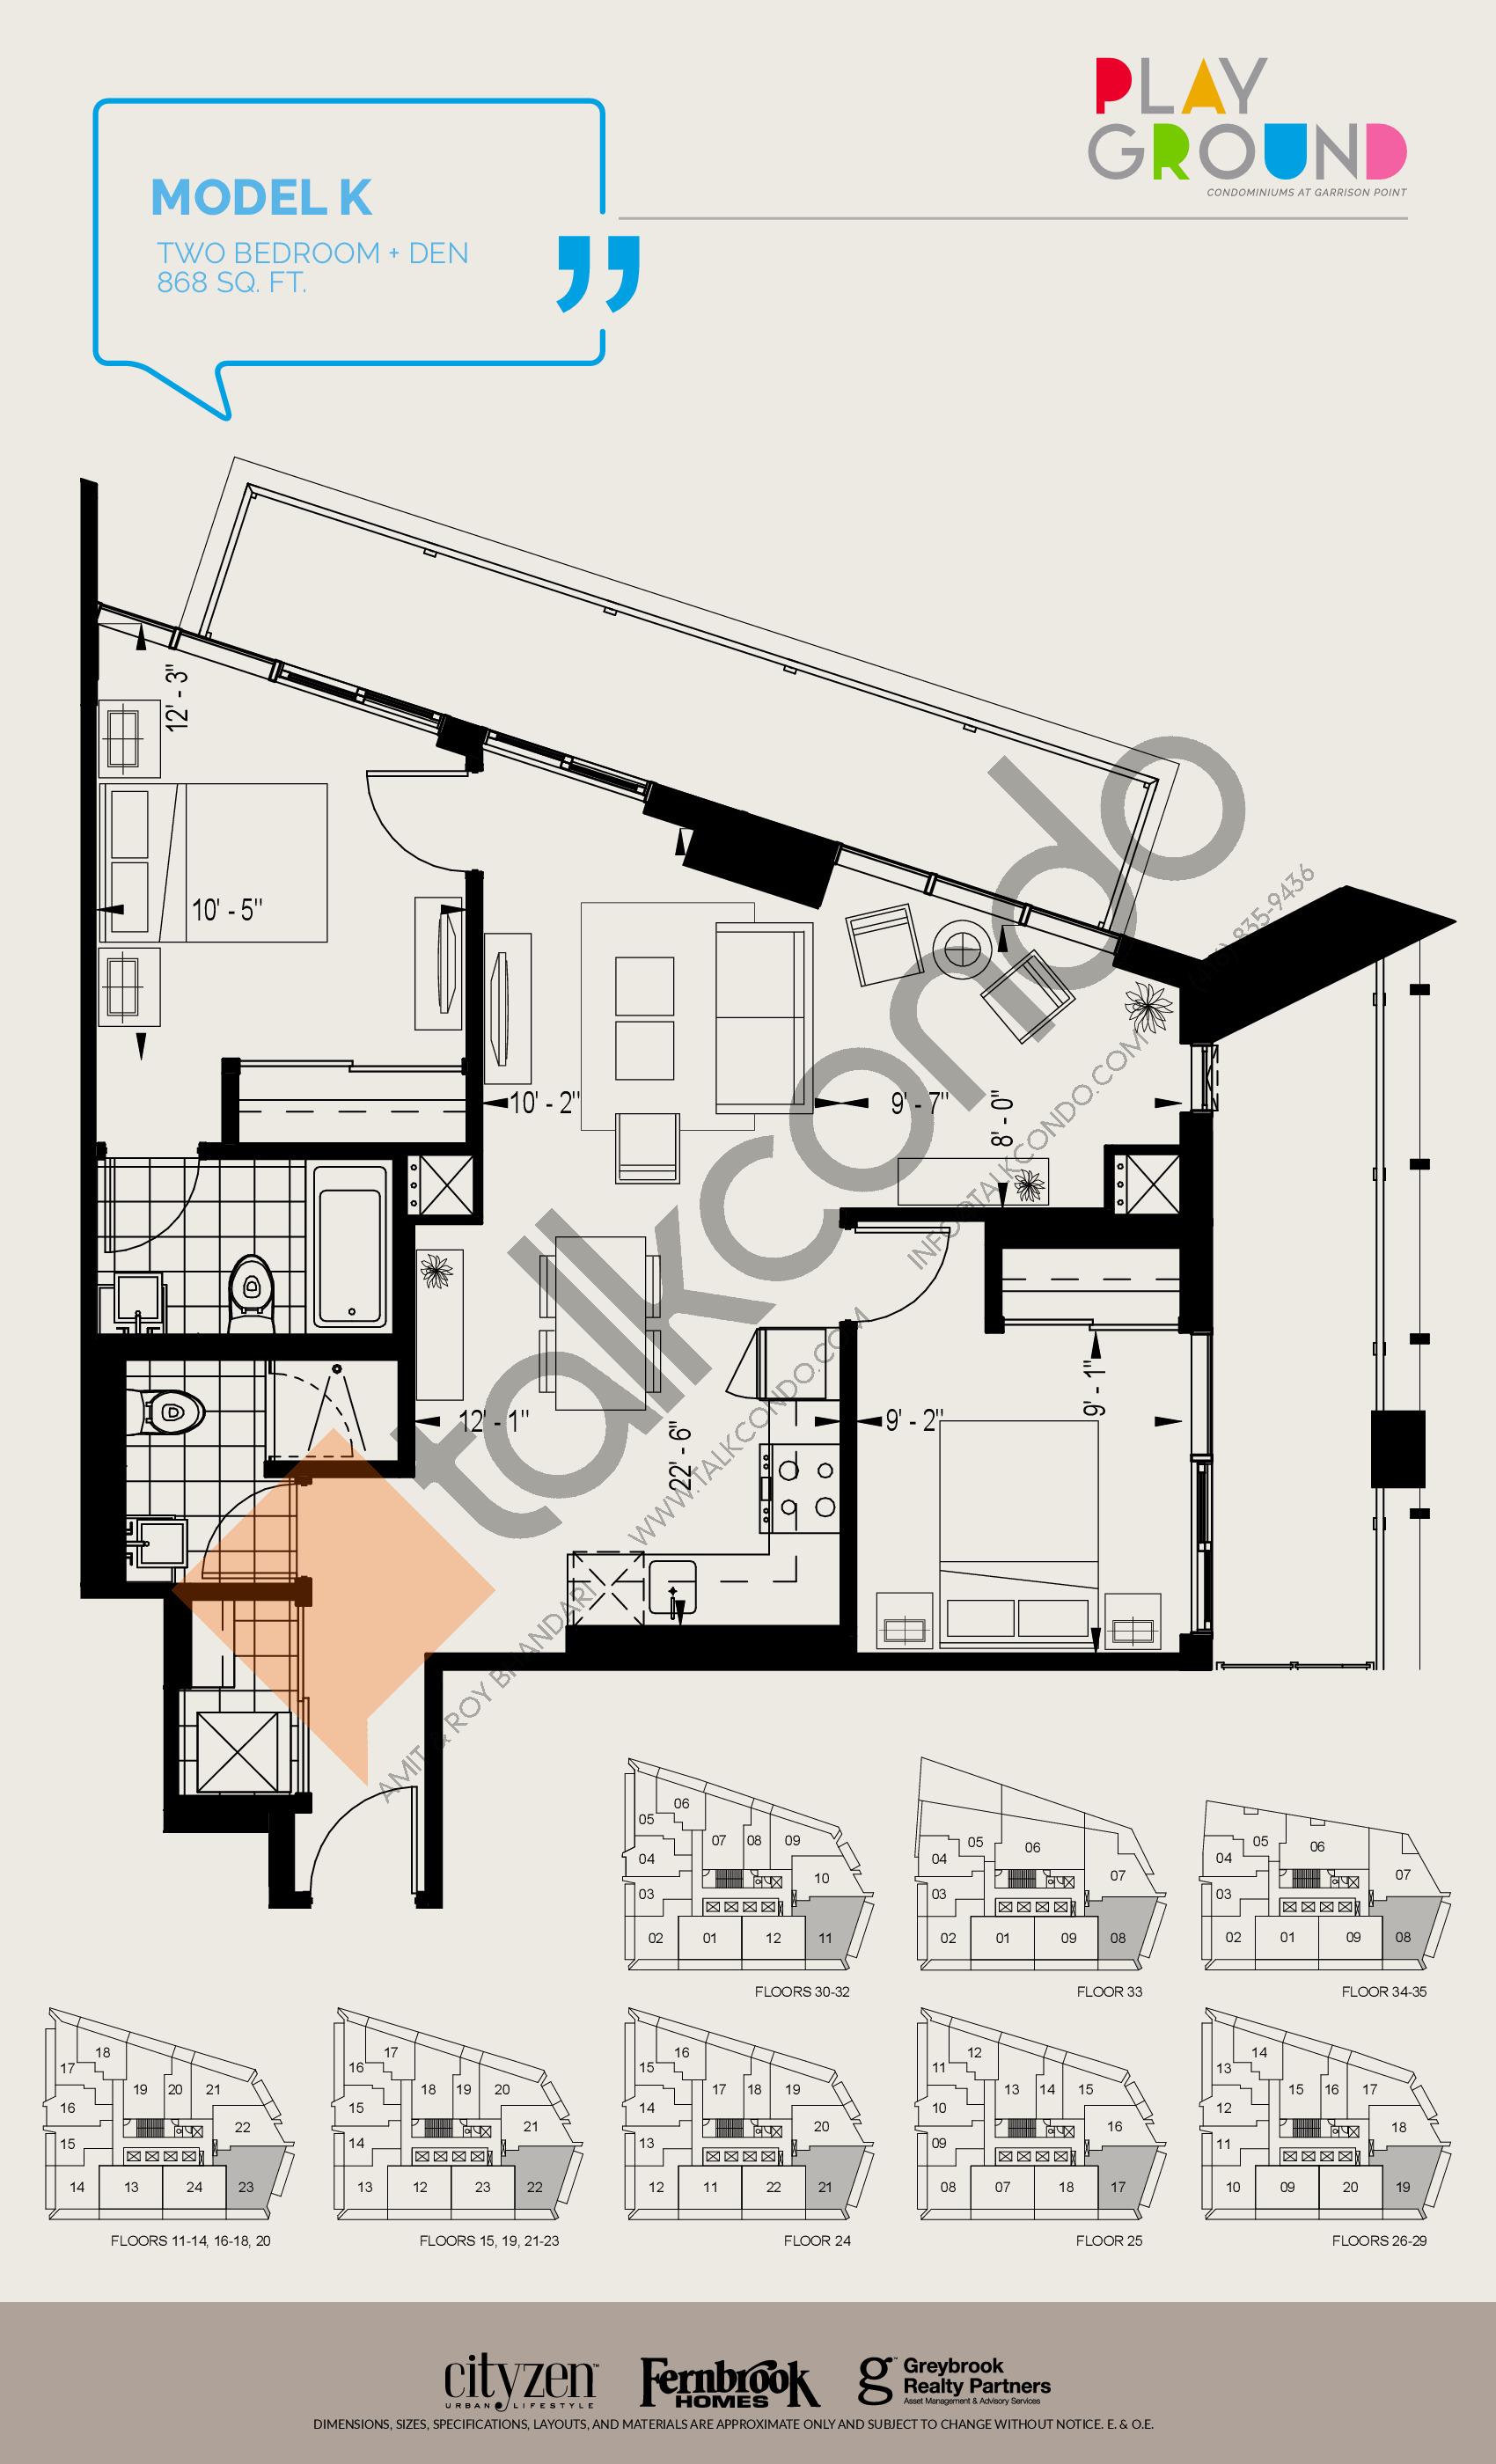 Model K Floor Plan at Playground Condos at Garrison Point - 868 sq.ft